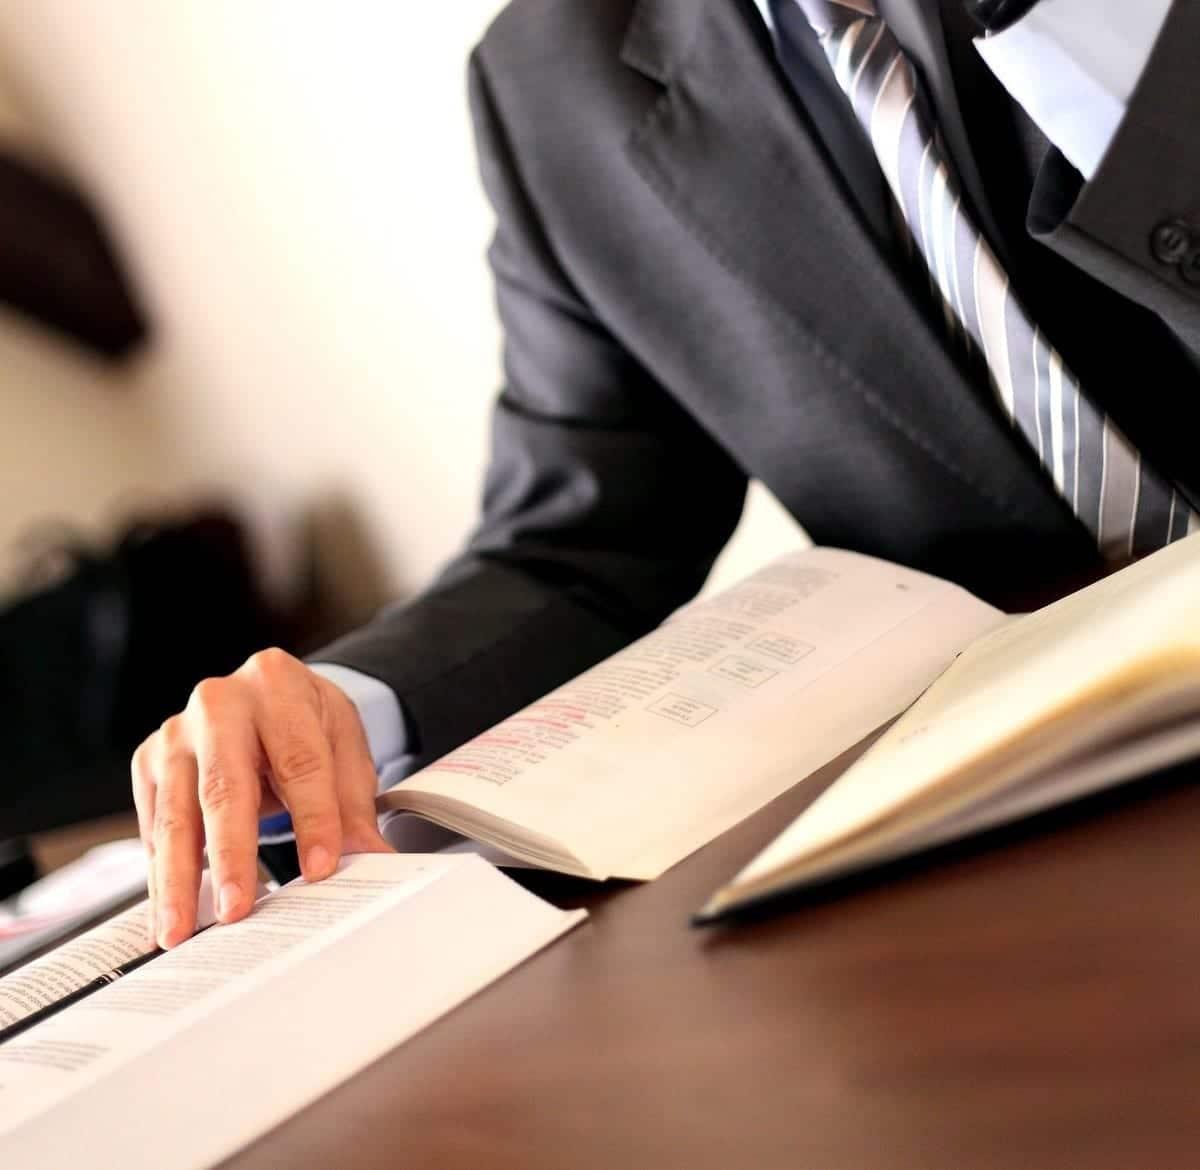 , Public Outing of DUI Defendants Latest Shameful Tactic